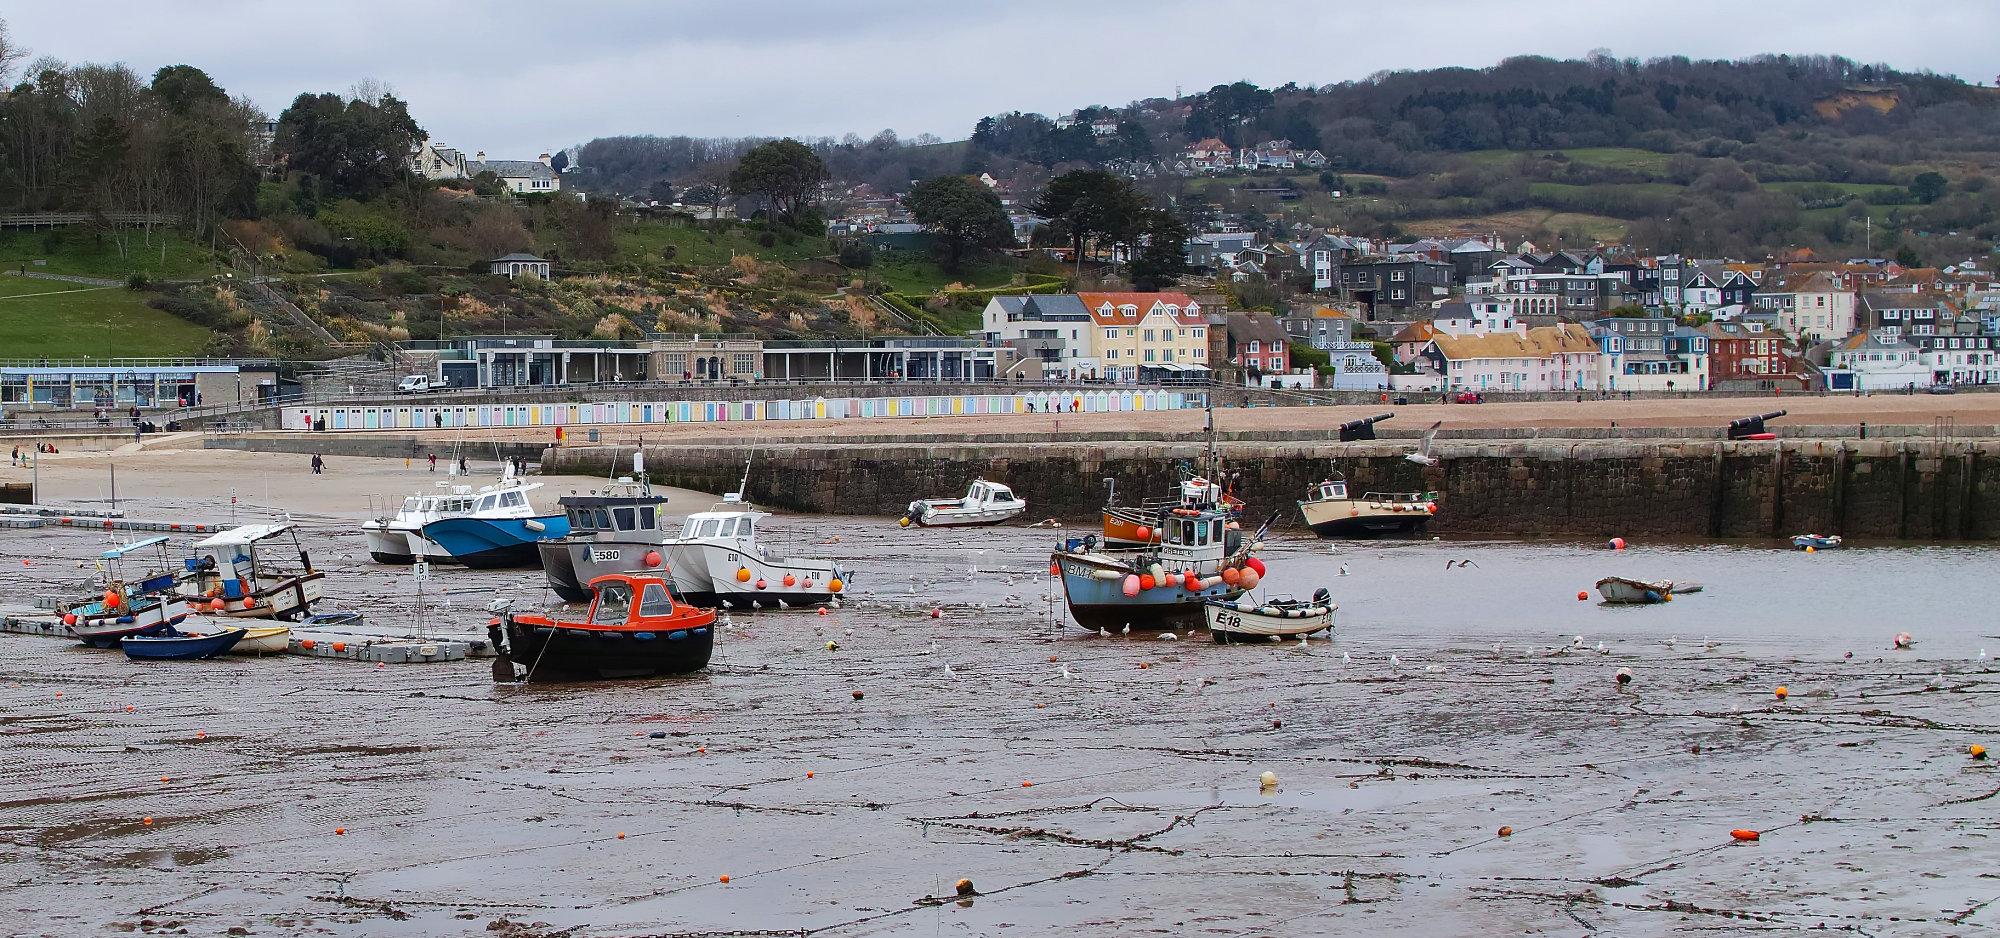 Lyme Regis from Harbour